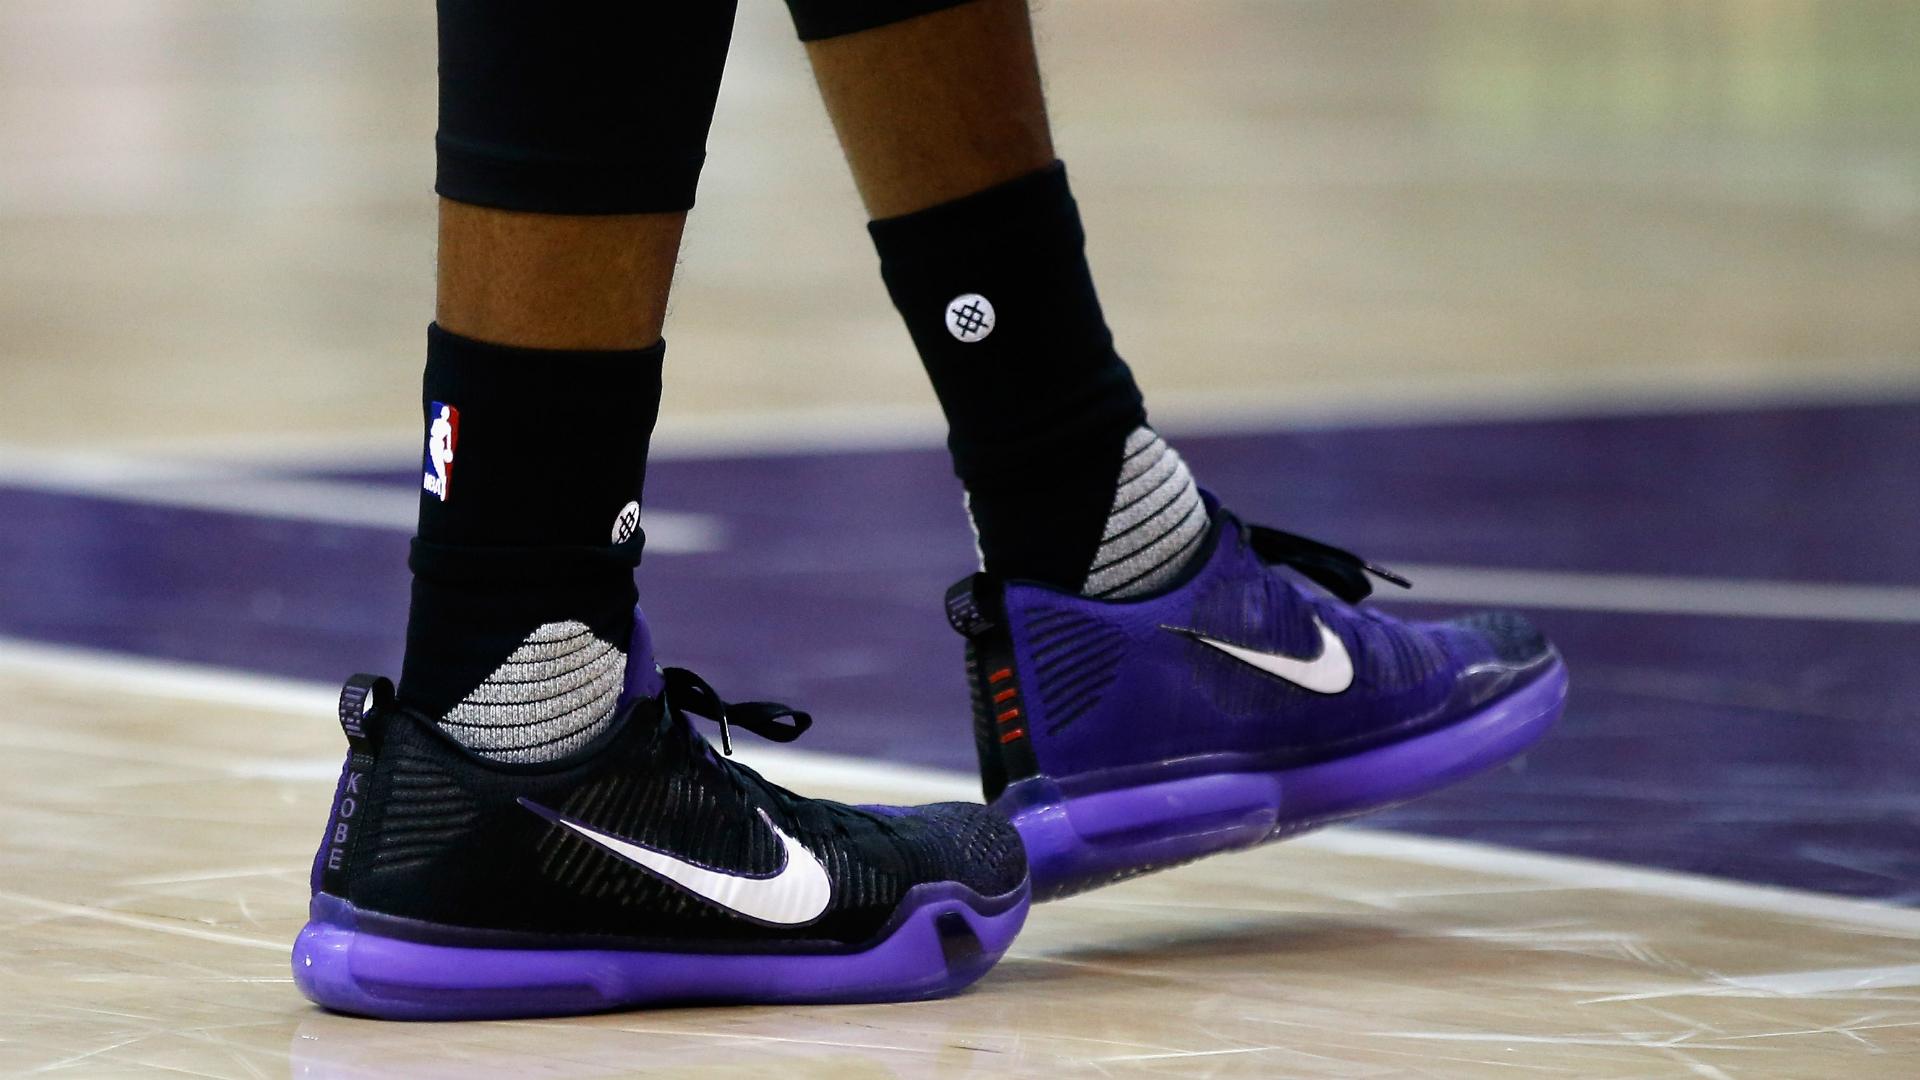 Kobe-Bryant-shoes-Getty-FTR-112015